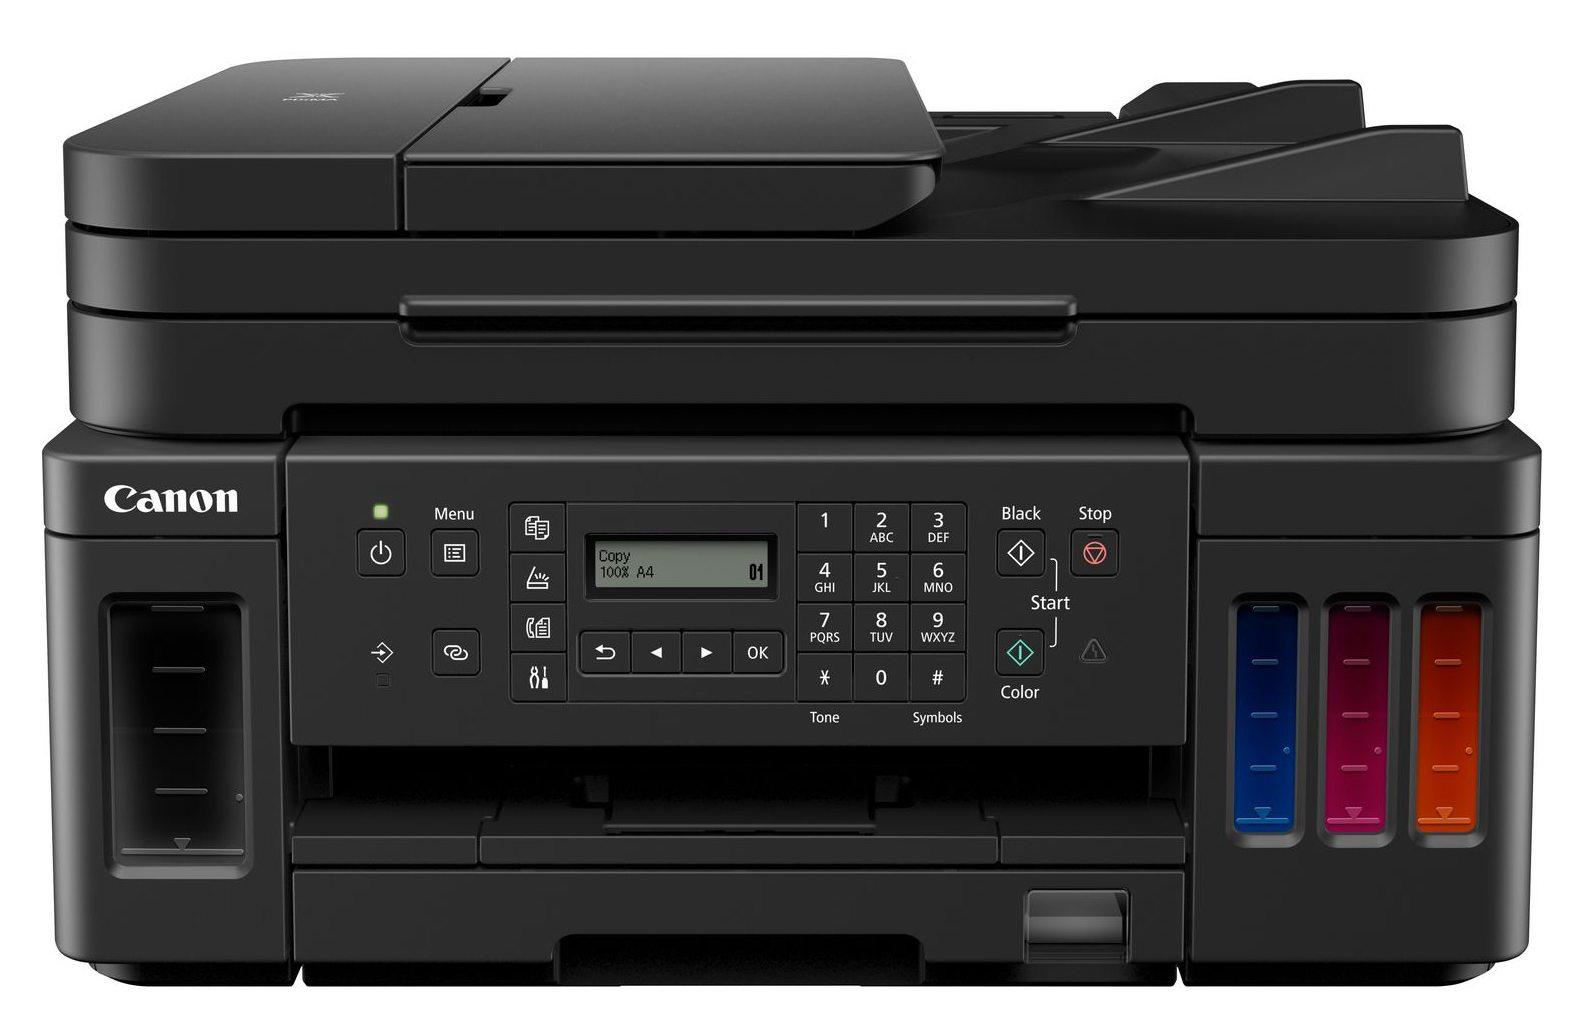 [Drucker.de] Canon PIXMA G7050 Multifunktionsdrucker refillable